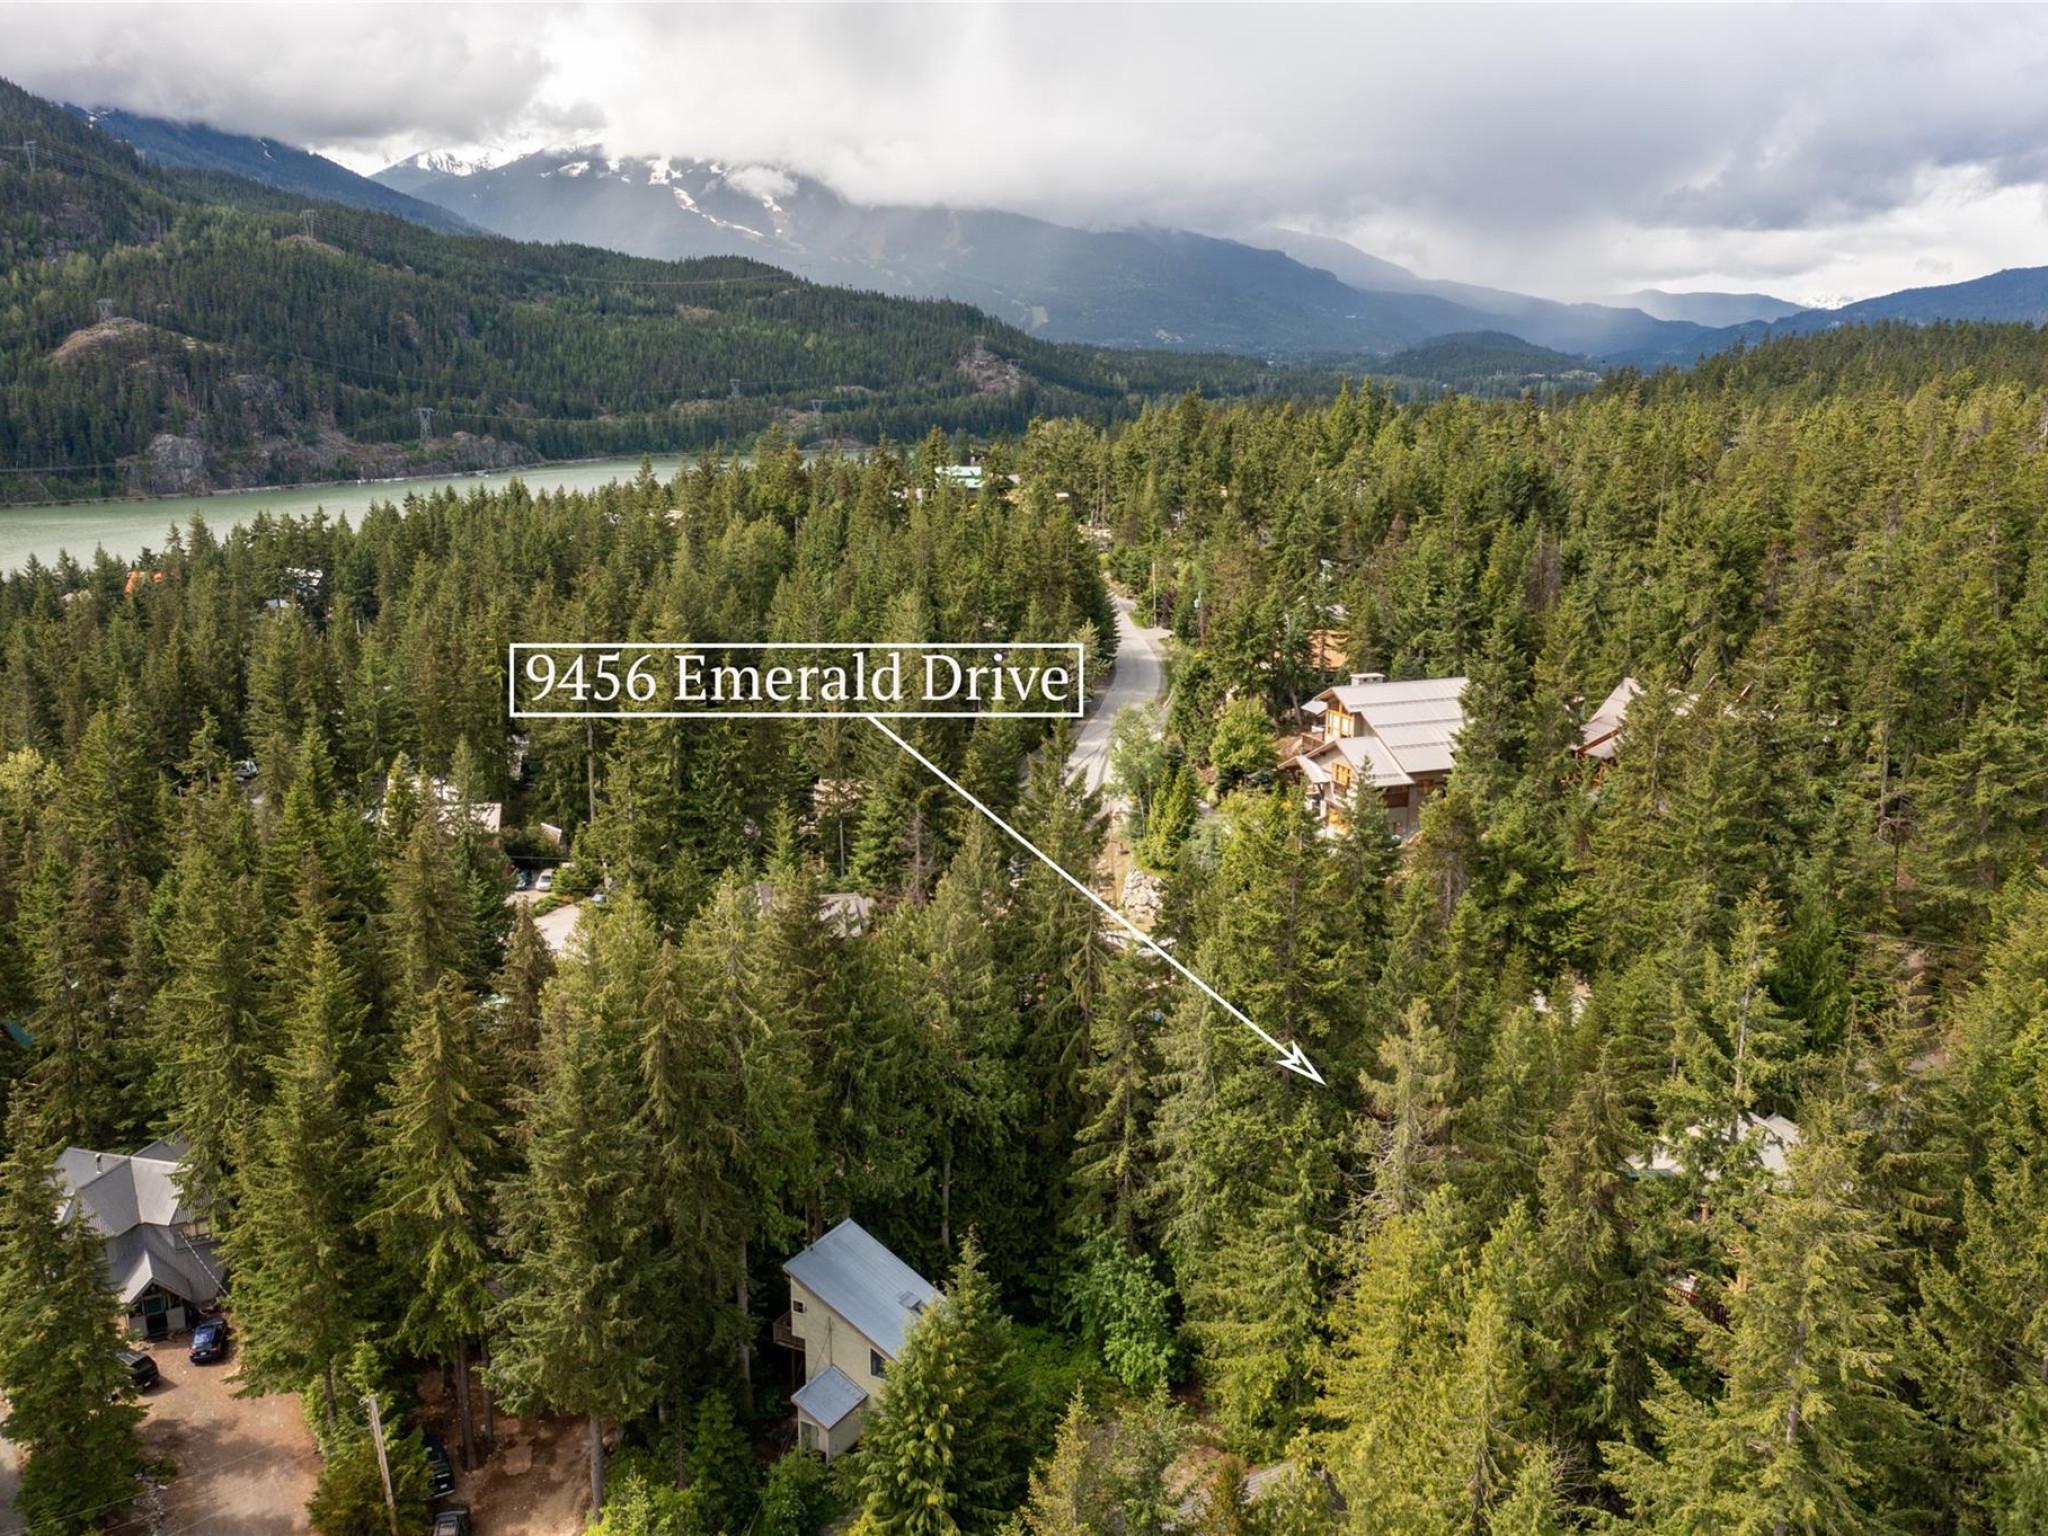 9456 Emerald Drive image